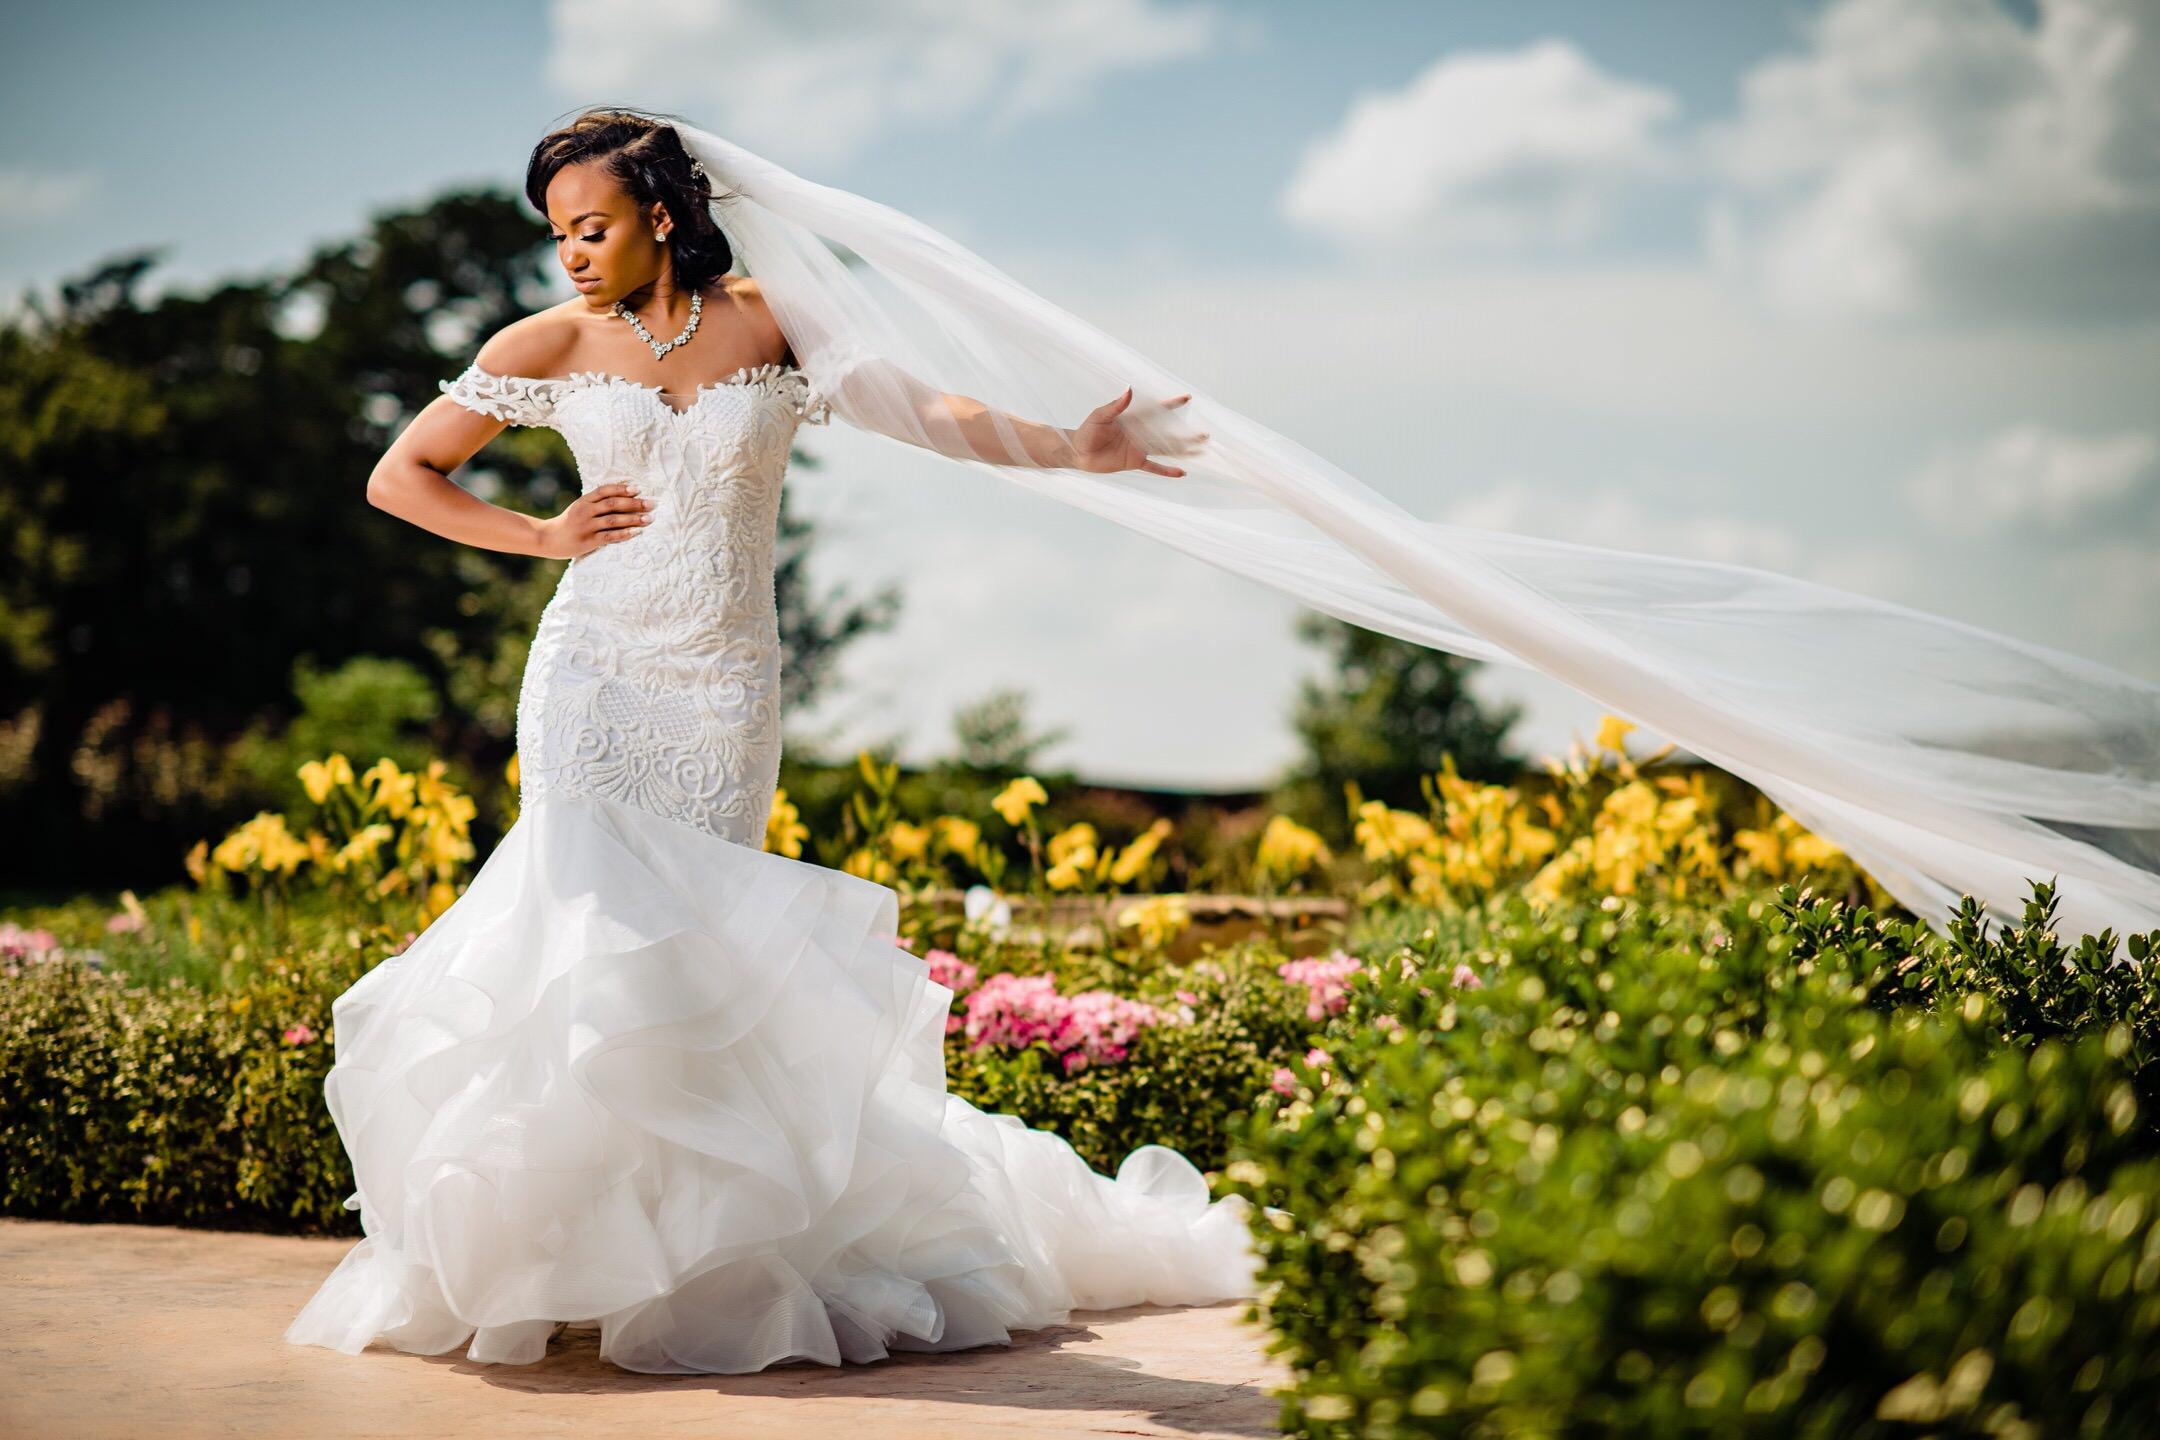 Leon-Contreras-Houston-Texas-Aggie-Wedding-Graduation-Engagement-Portrait-Photographer-30474.JPG